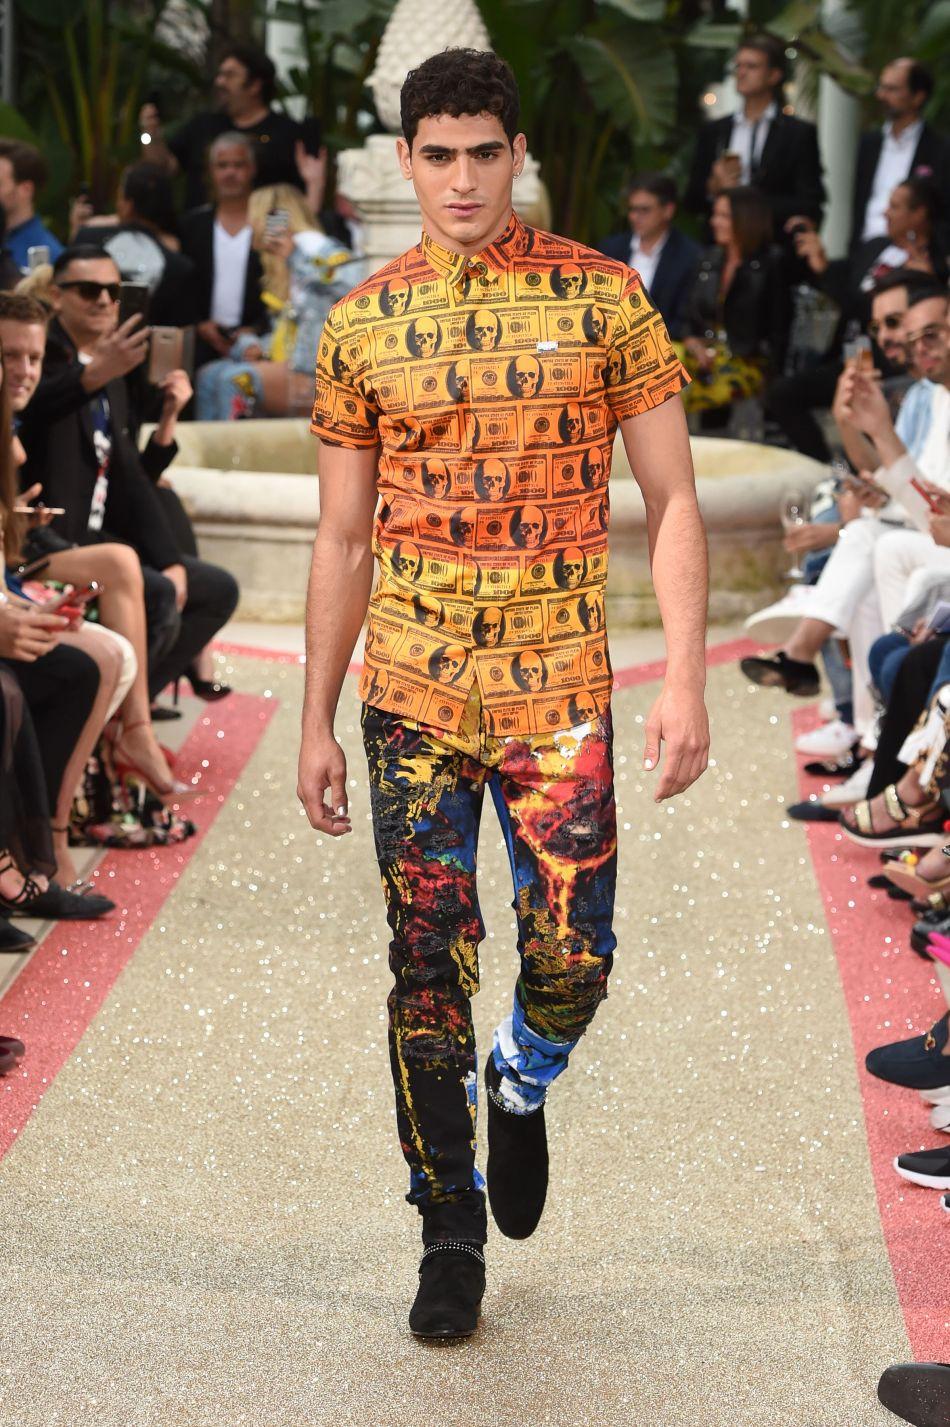 International fashion designer Philipp Plein presents Dynasty the Resort 2019 in Cannes.